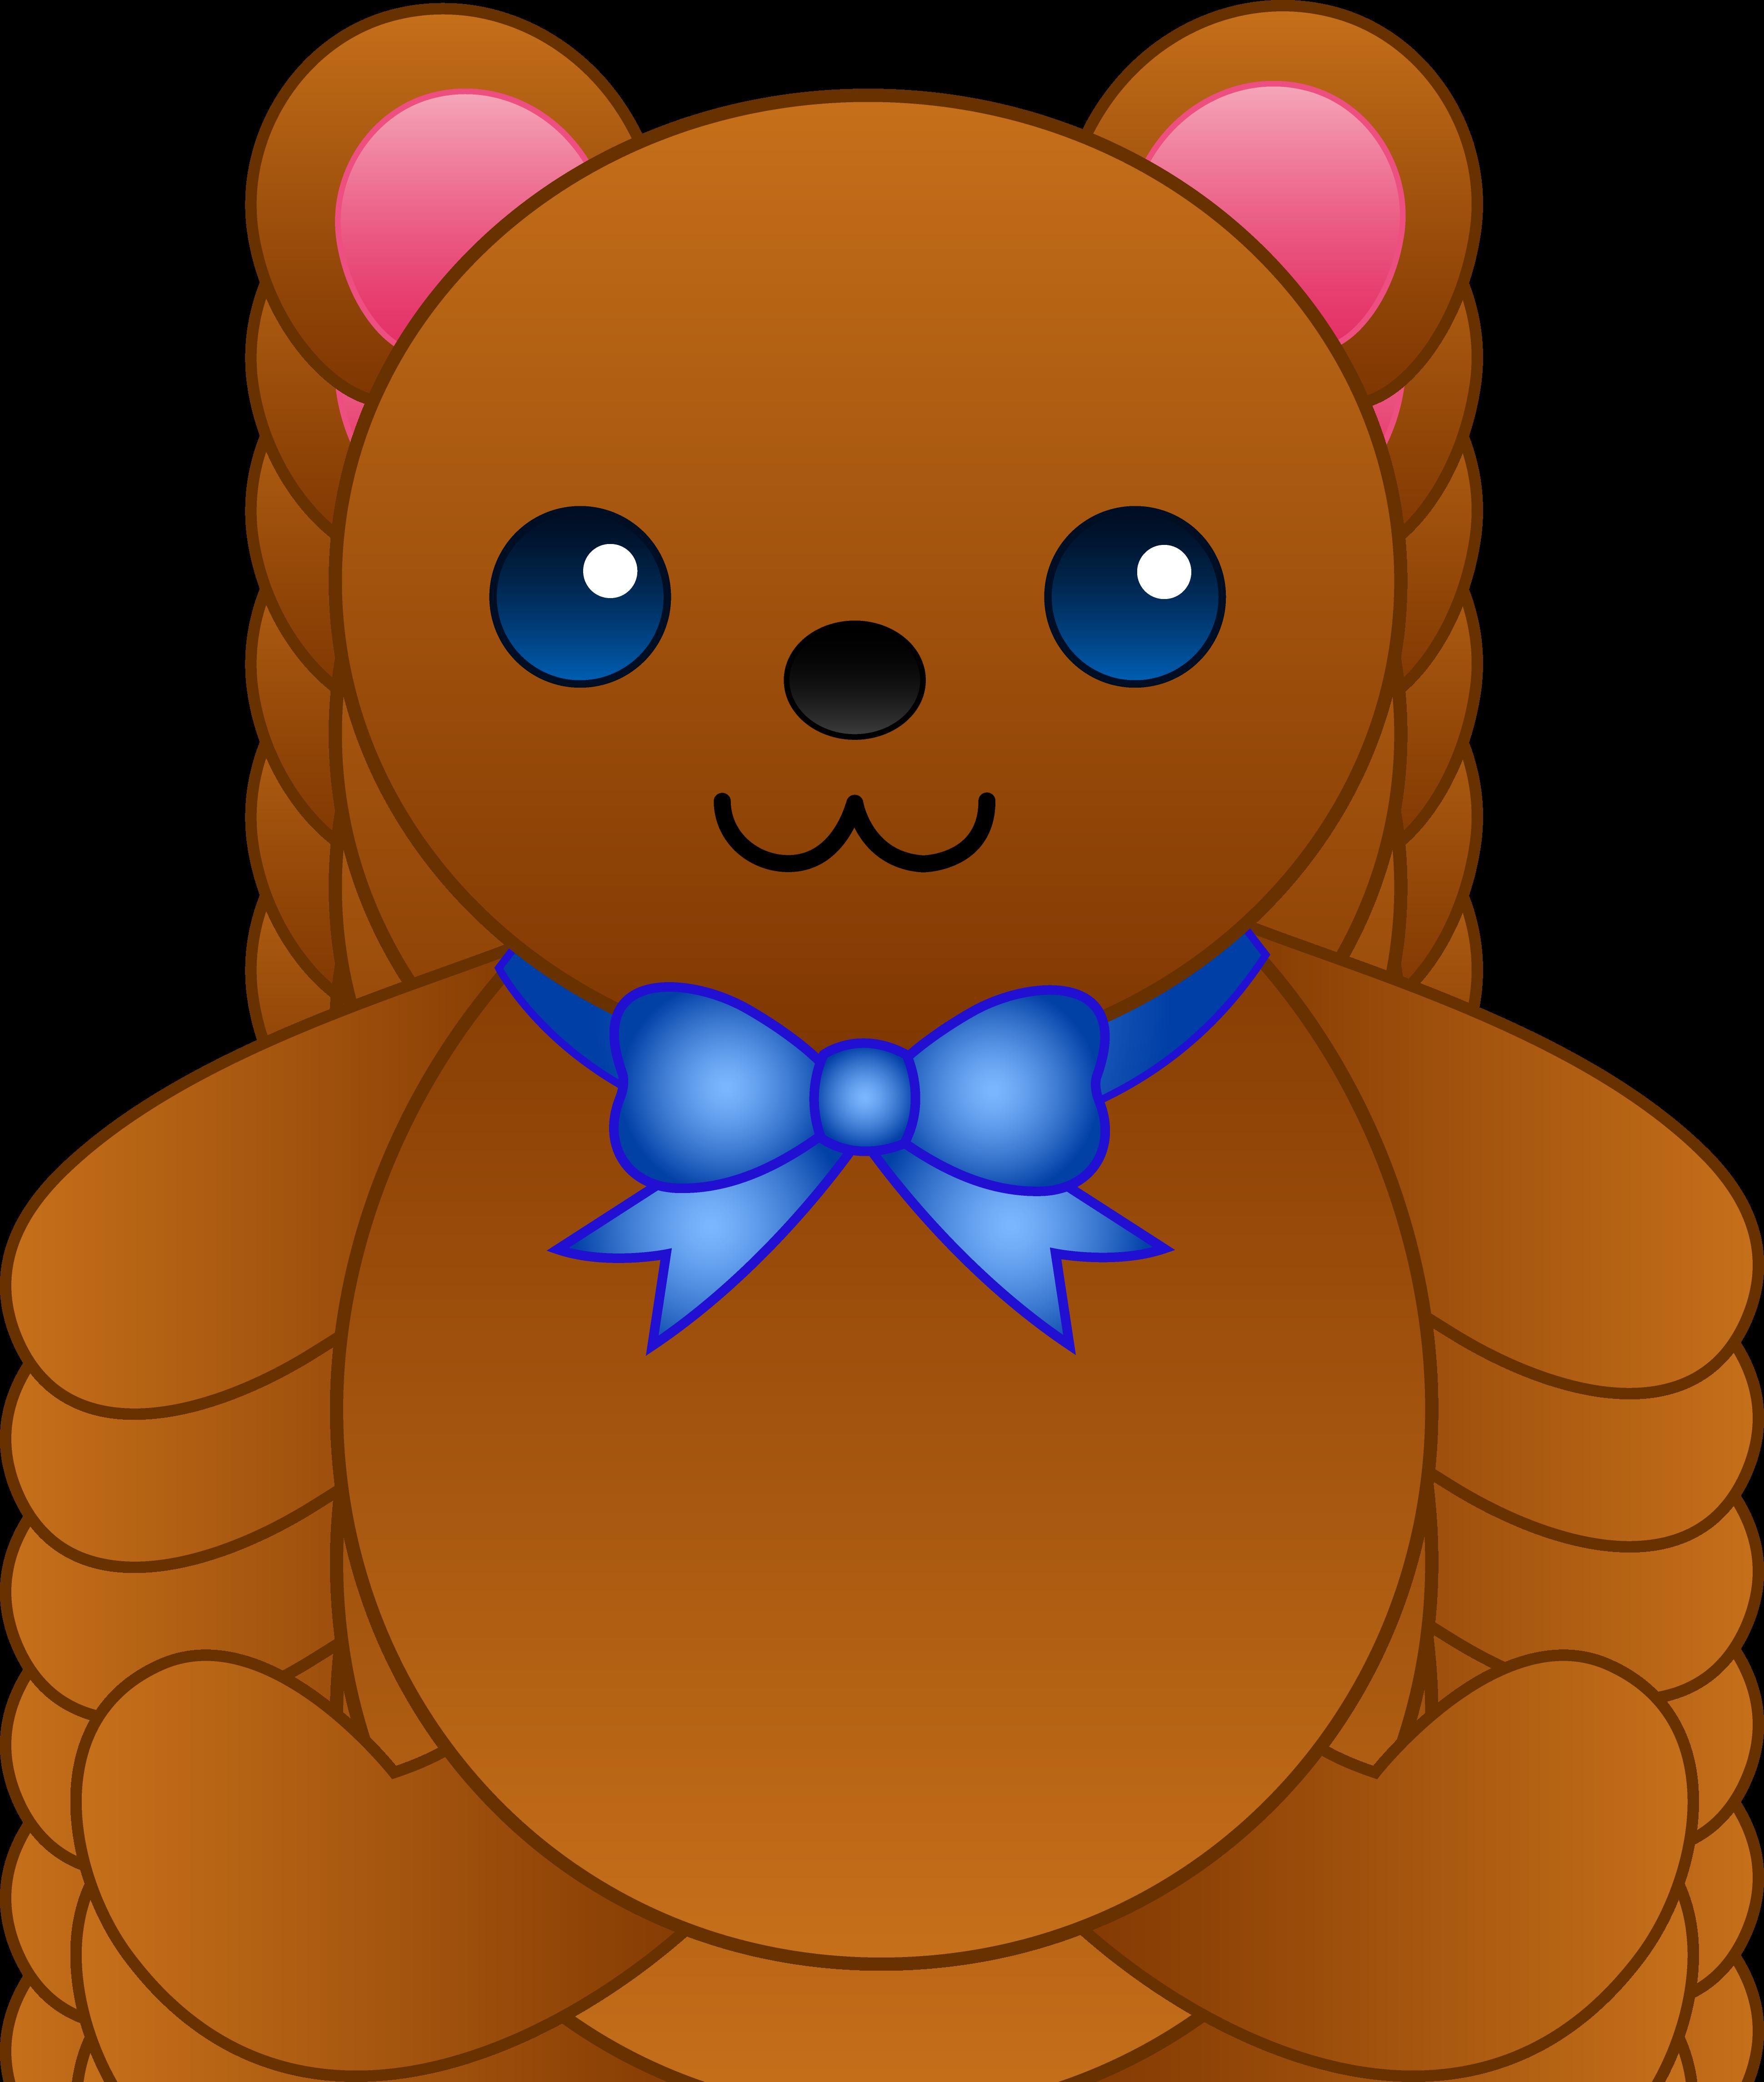 Xray clipart cartoon. Free teddy bears download